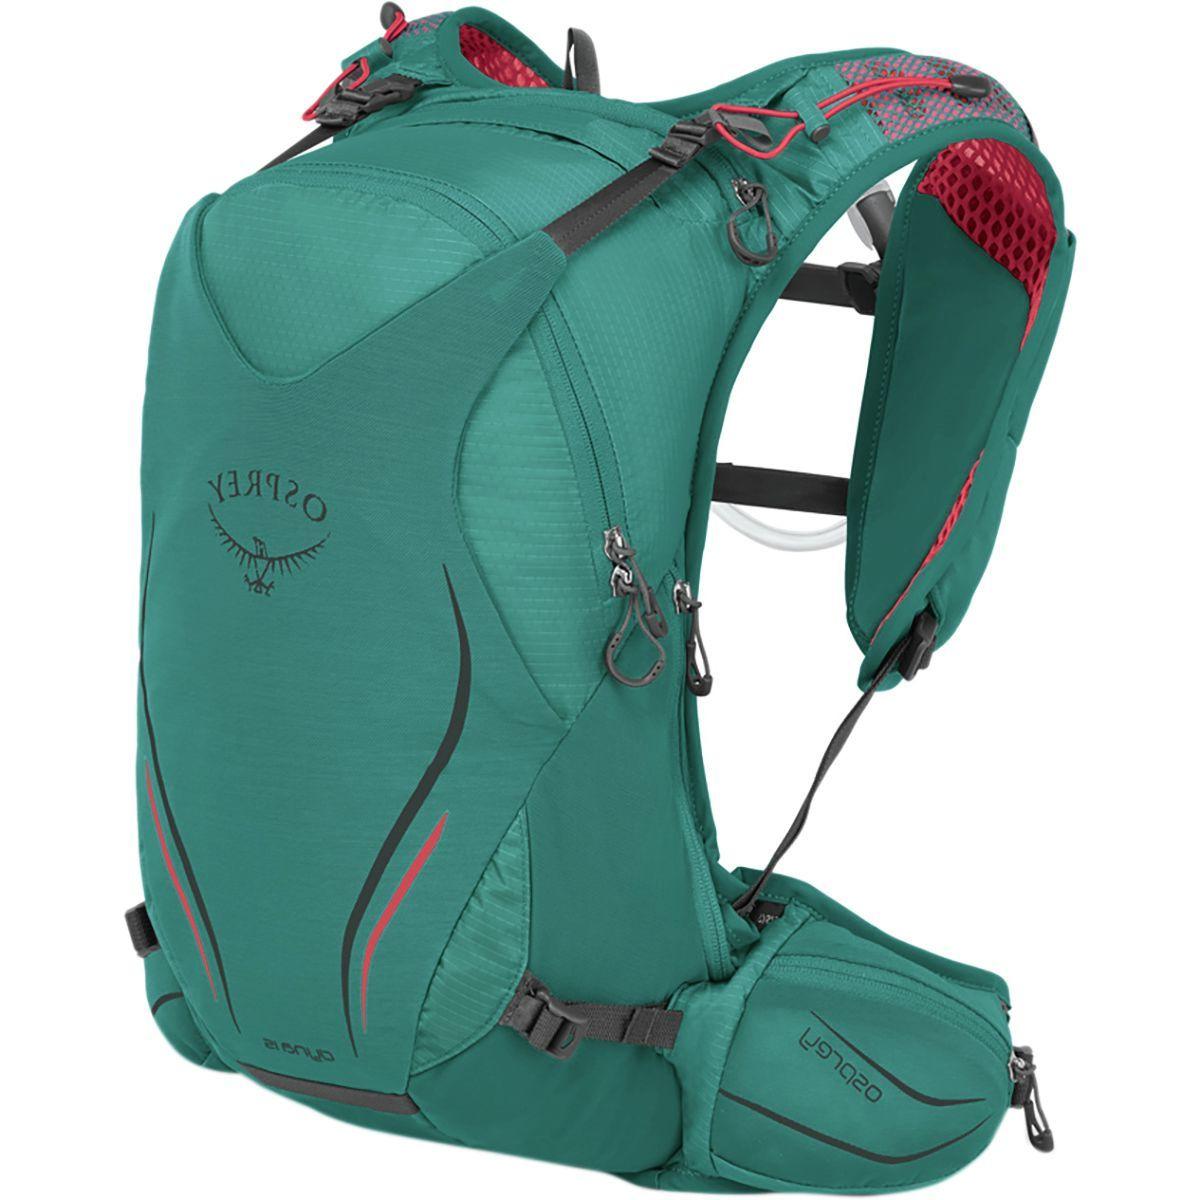 Osprey Packs Dyna 15L Backpack - Women's